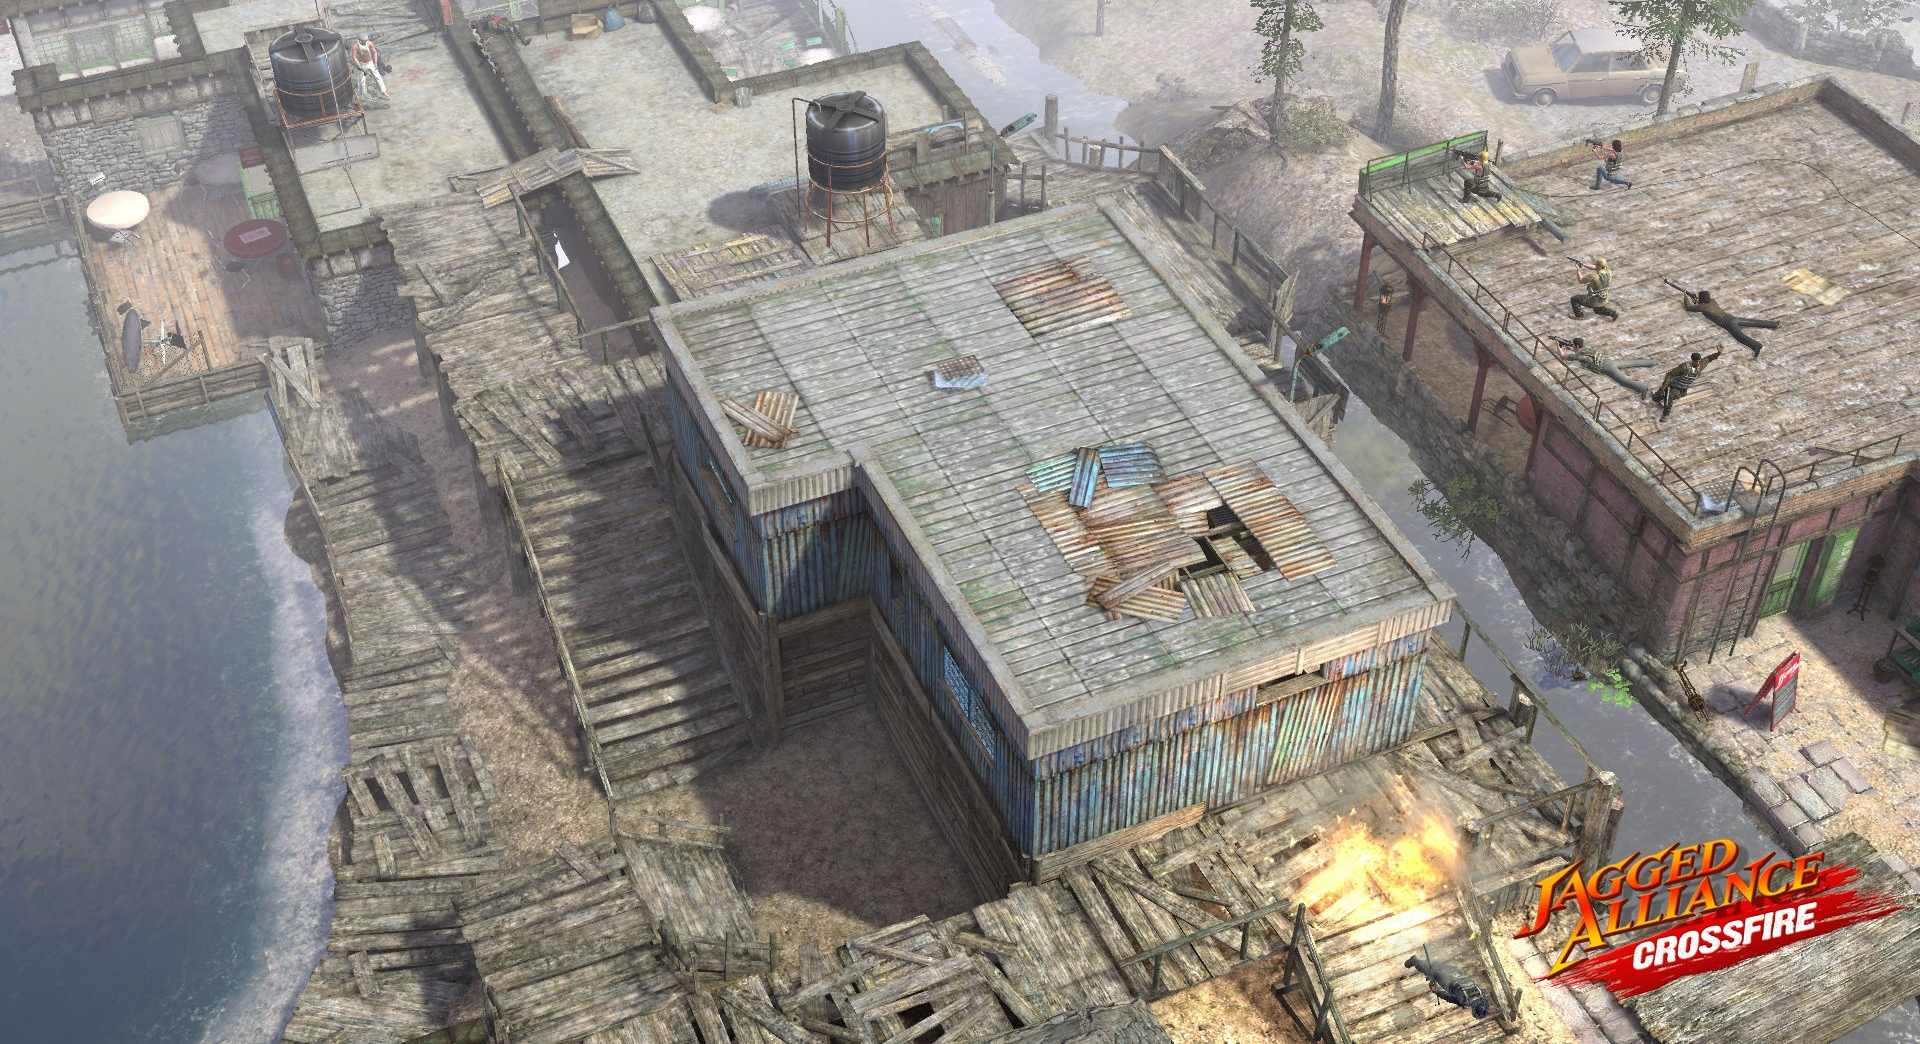 raid in buildings by a dock